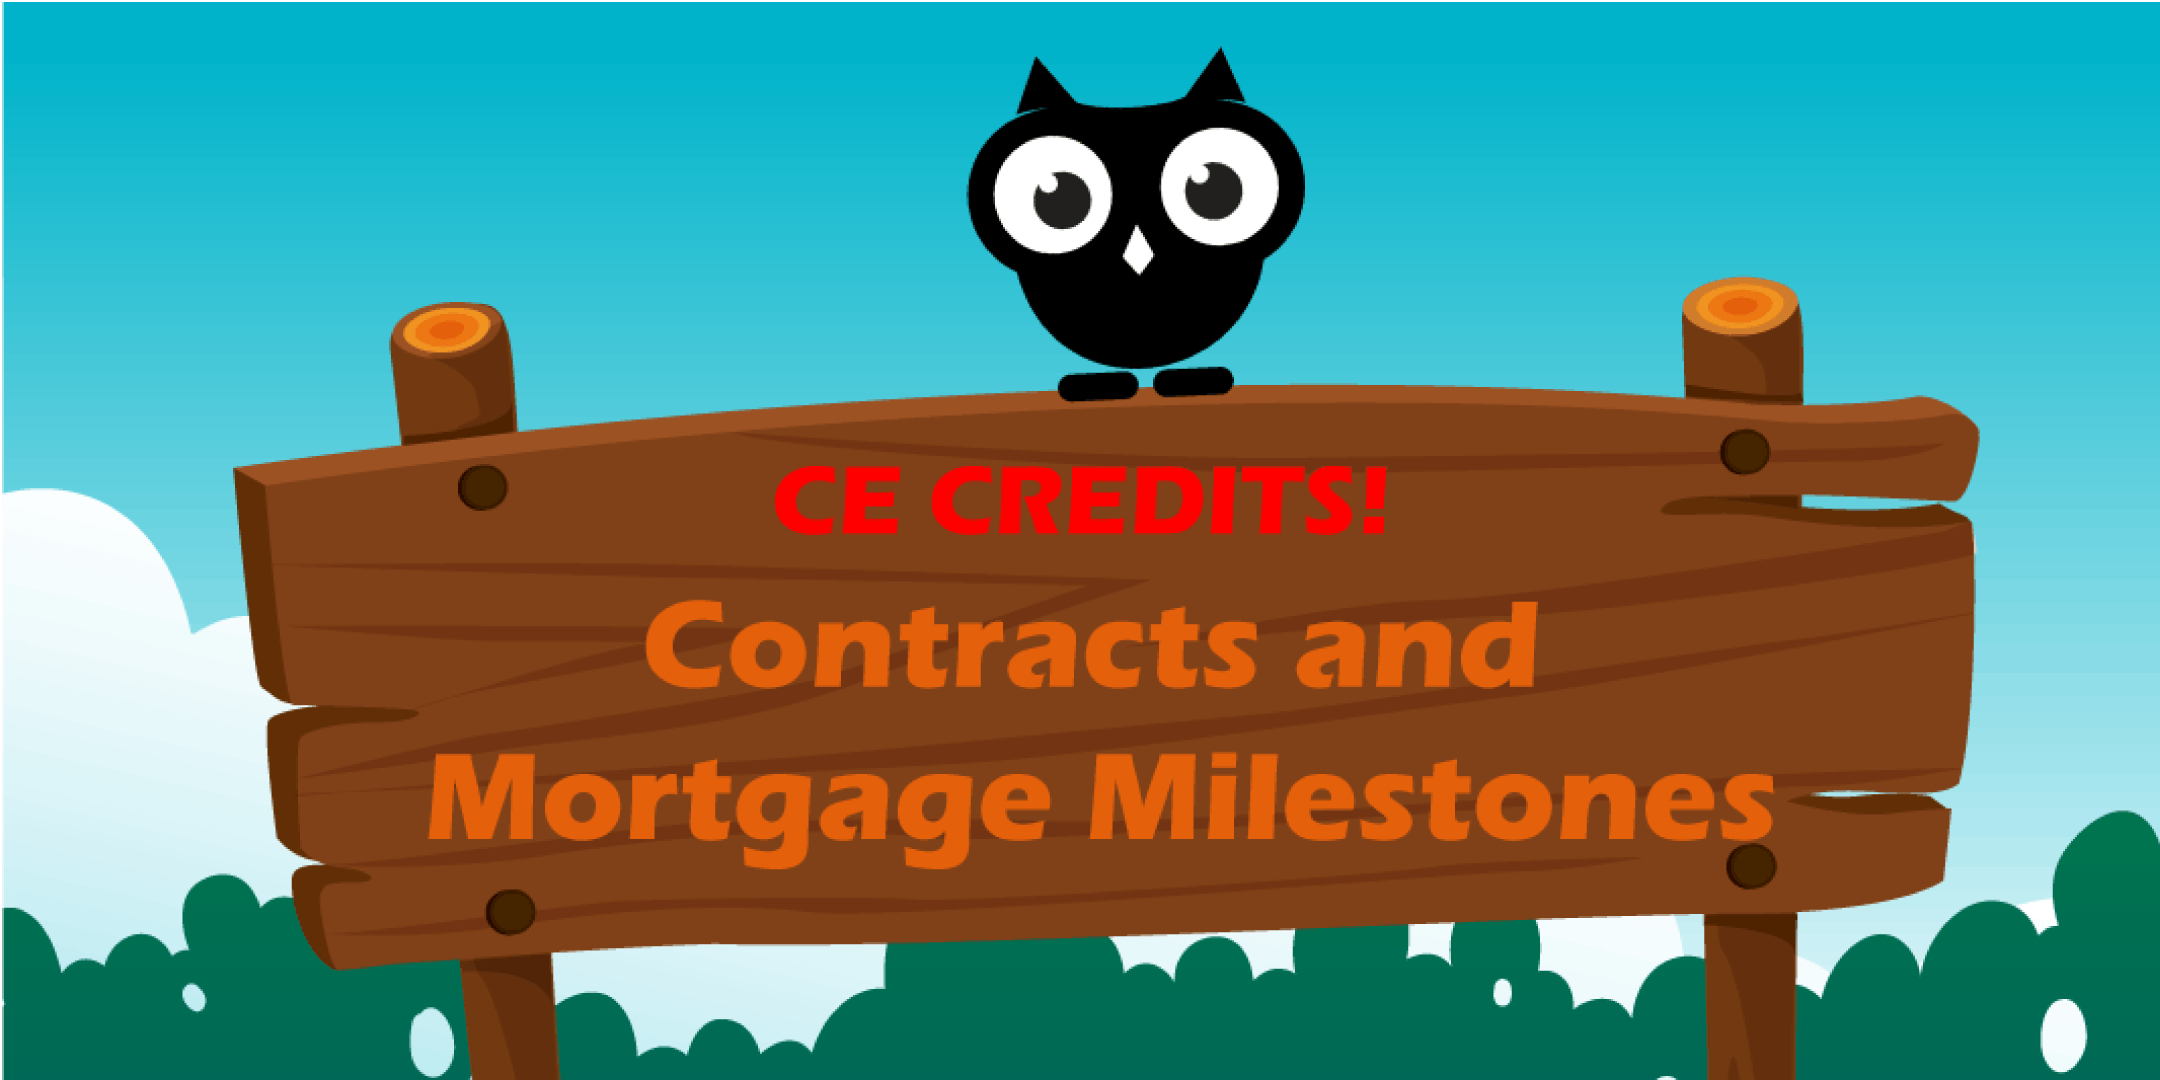 November 15th: Contracts and Mortgage Milesto